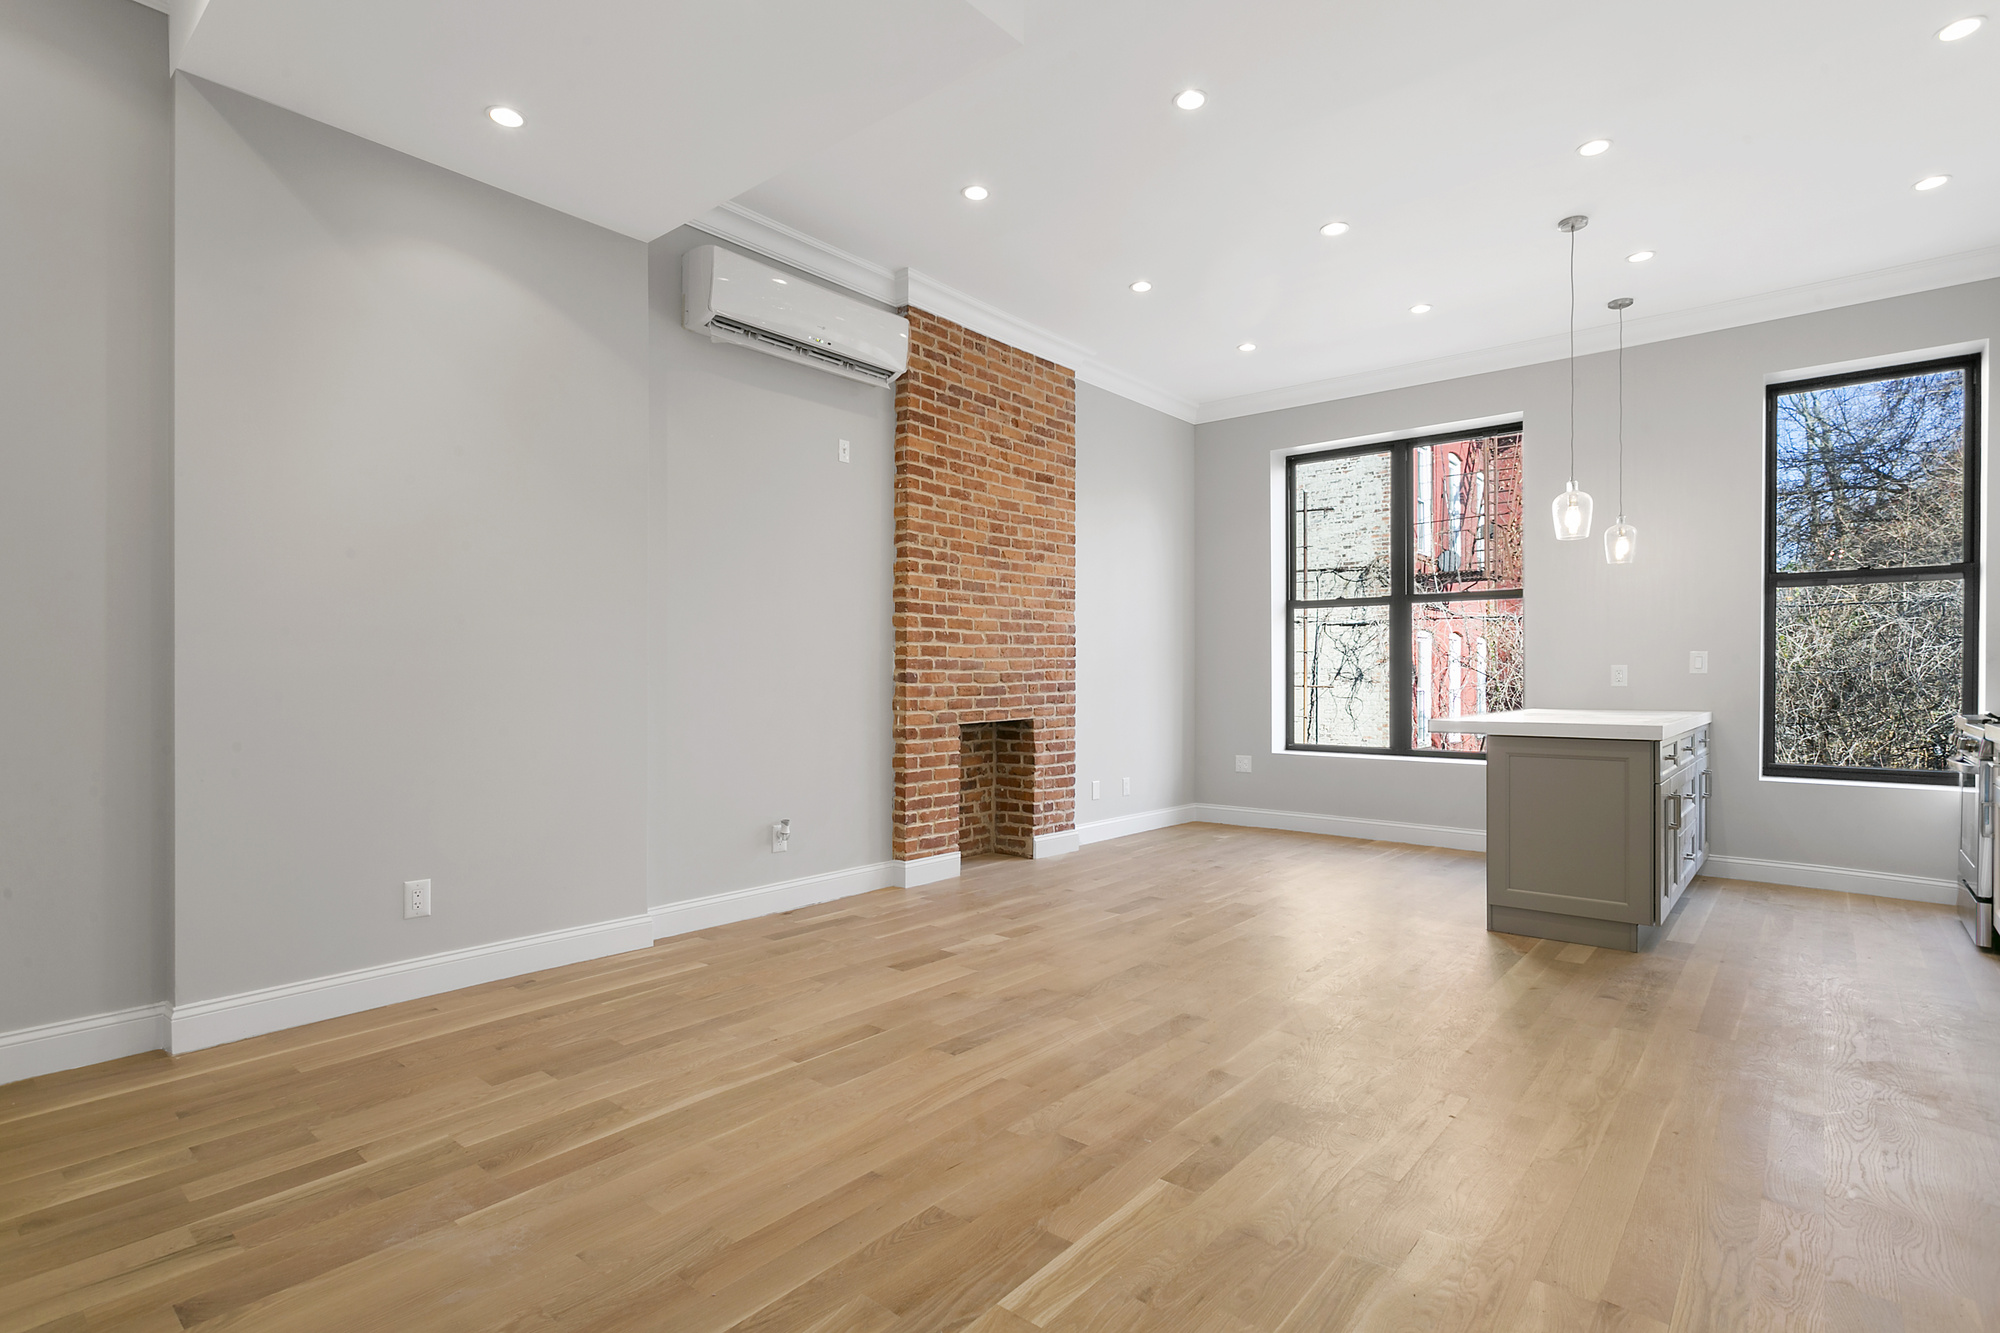 91 Saratoga Avenue - Bedford - Stuyvesant, New York